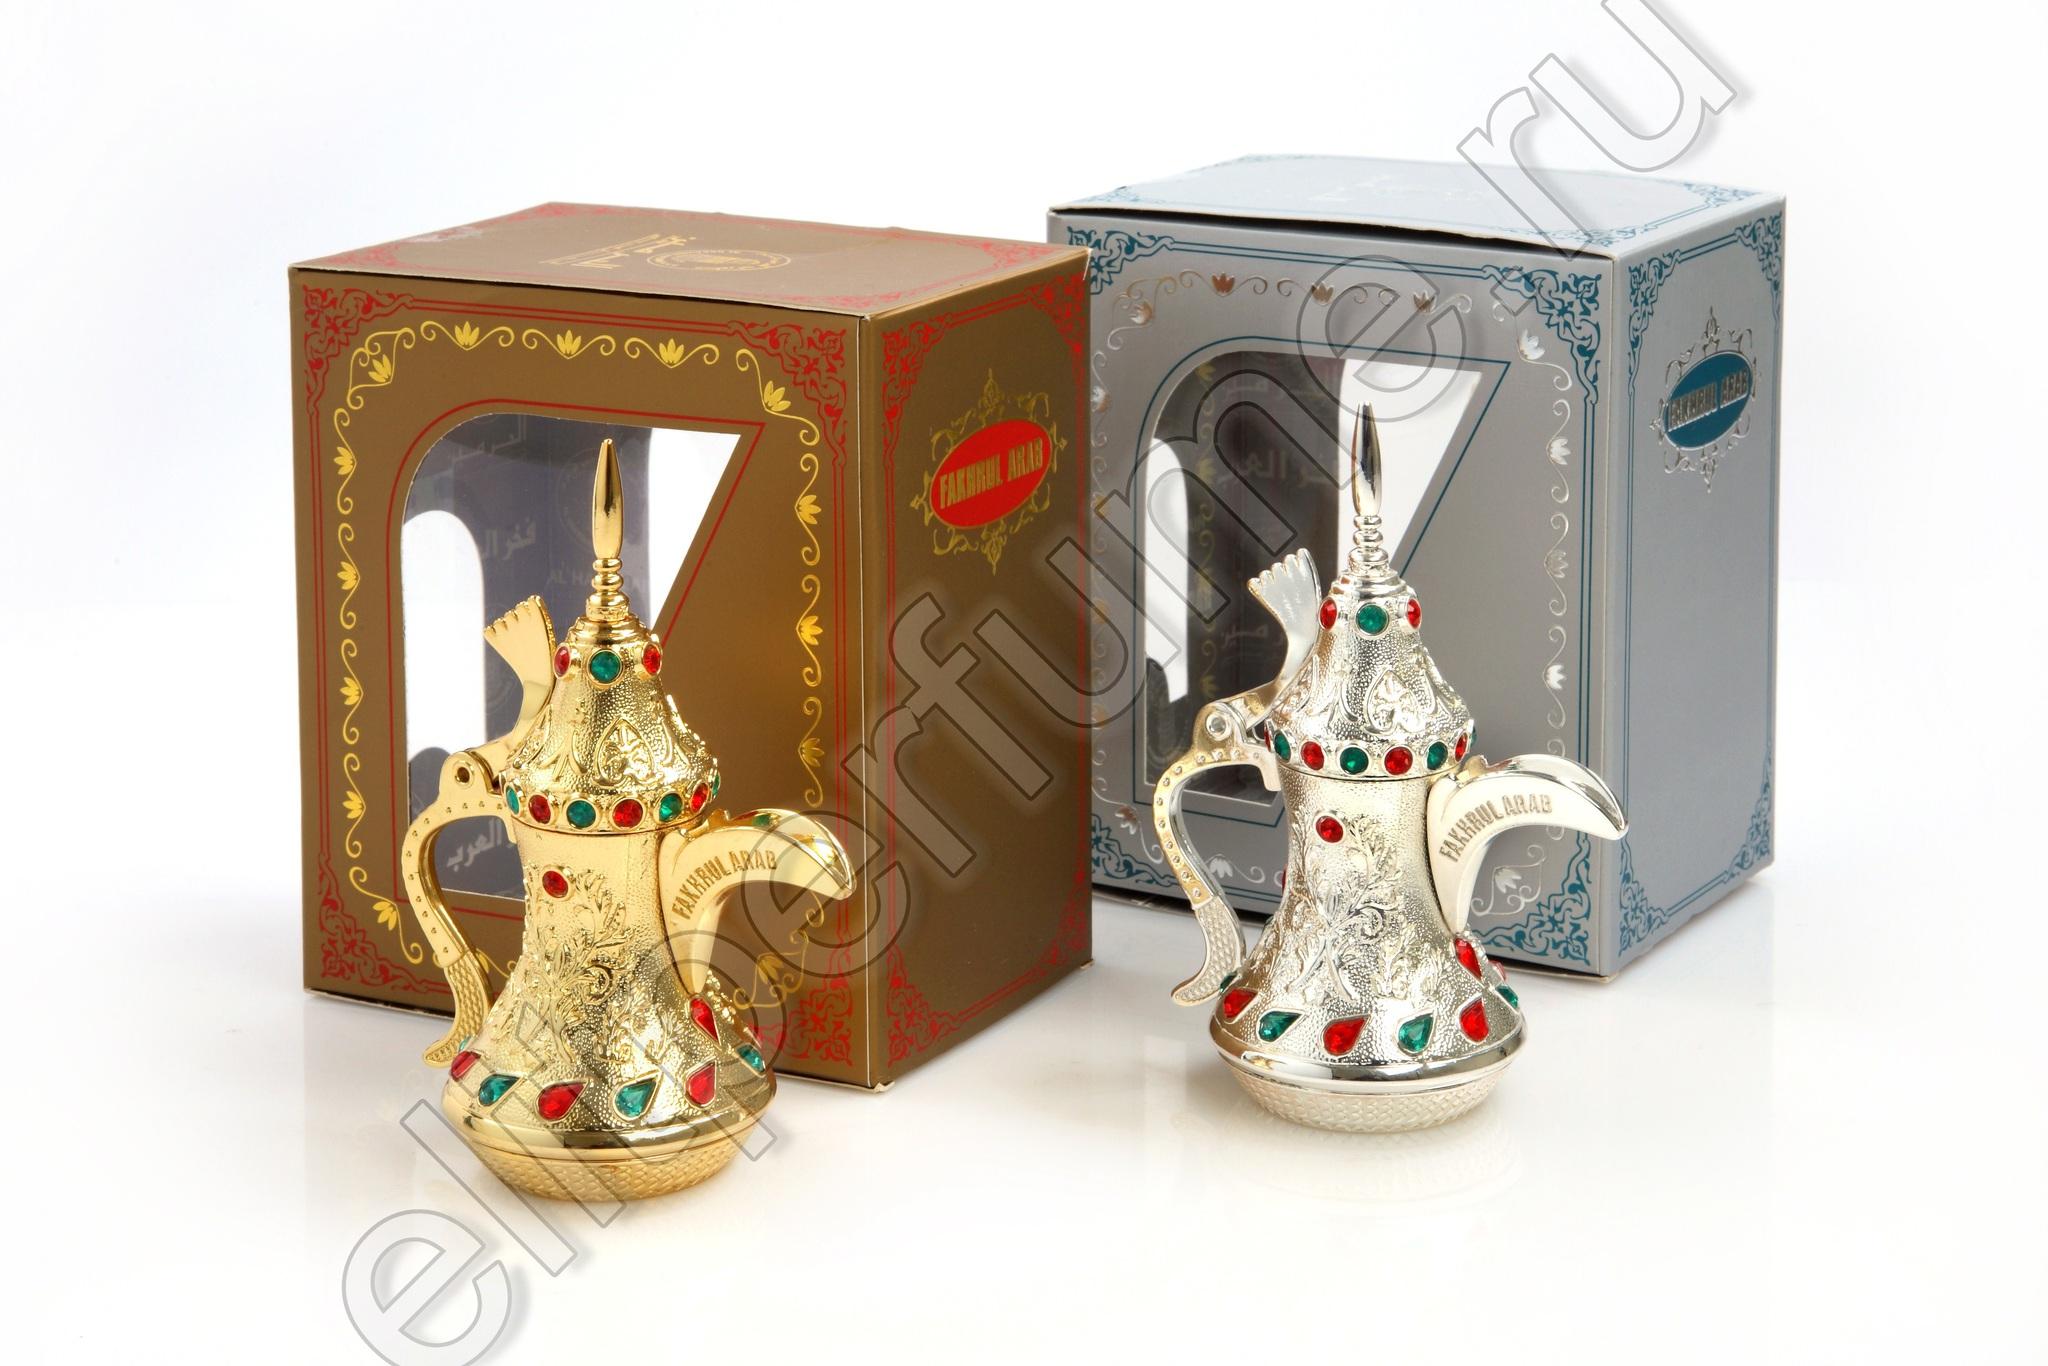 Пробники для духов Фахруль Араб Fakhrul Arab (Gold/Silver , Золото/Серебро) 1 мл арабские масляные духи от Аль Харамайн Al Haramin Perfumes